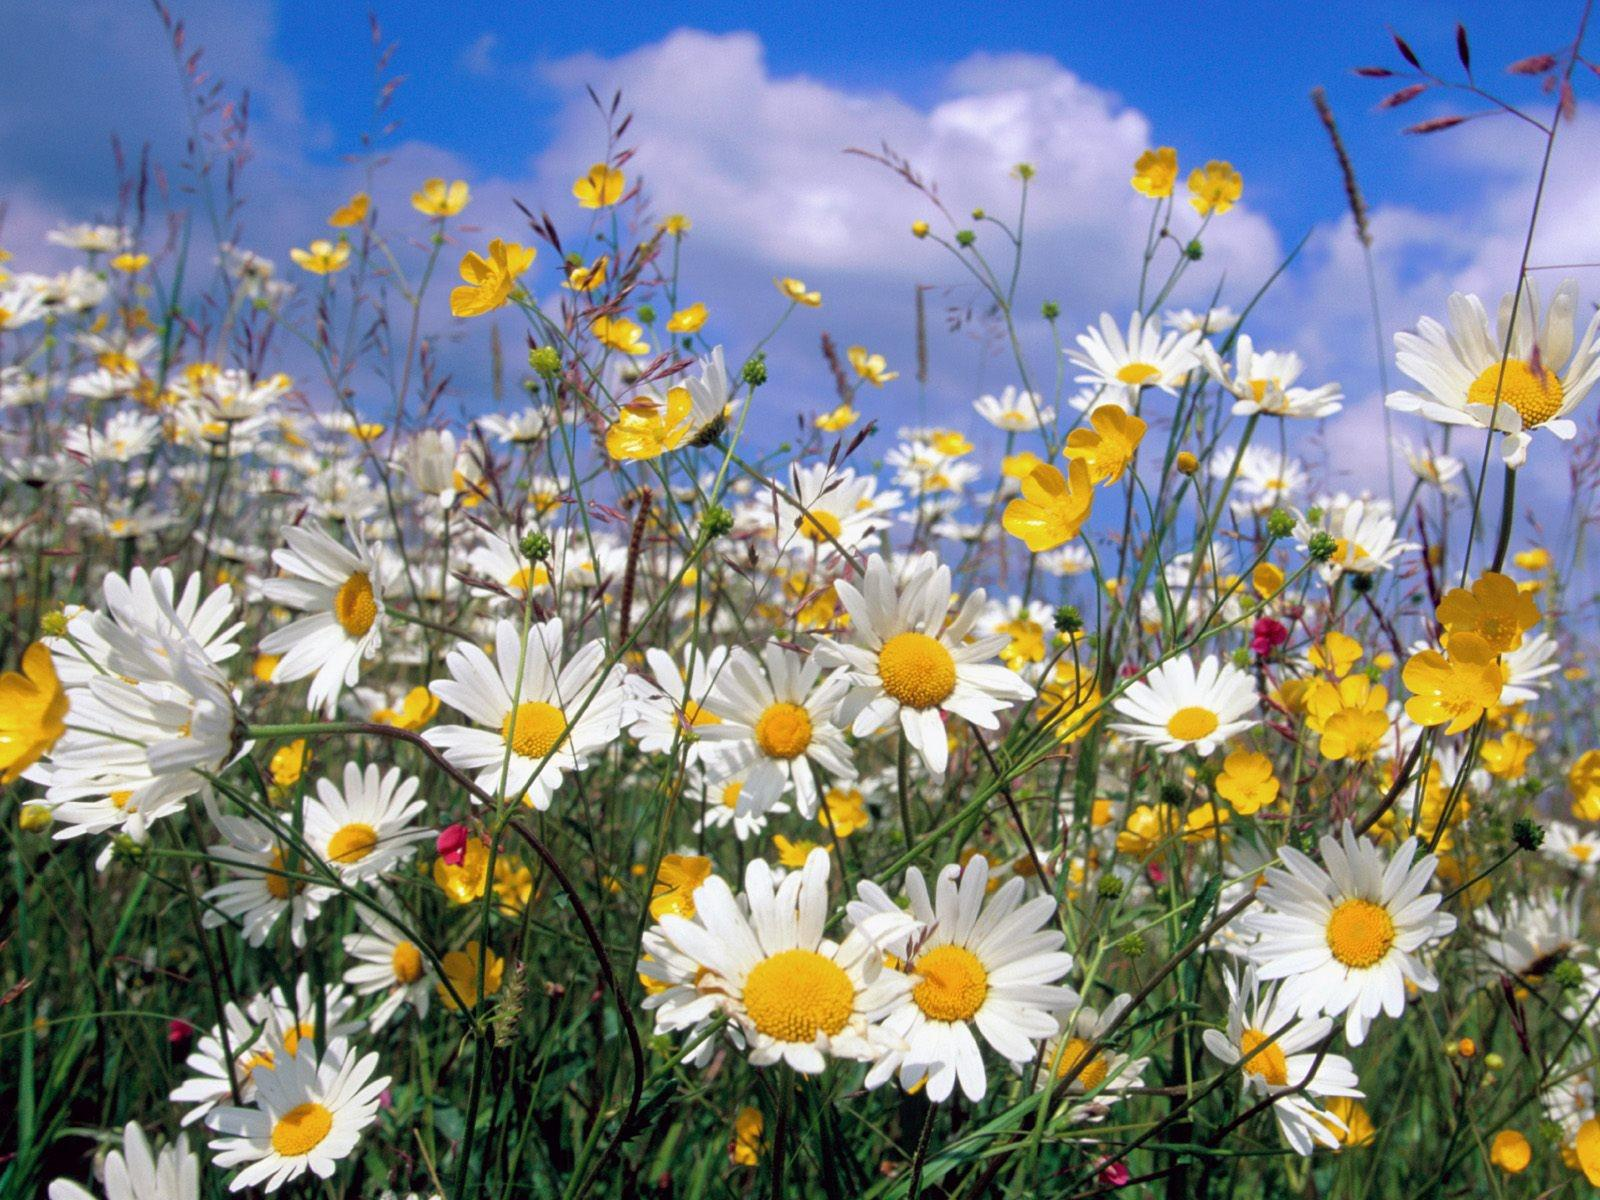 http://4.bp.blogspot.com/-Ul4iR-sOg_o/Tb8xDdvVUXI/AAAAAAAAAHg/kSpv-N1aL3c/s1600/p8-164-wallpaper-fleurs.jpg